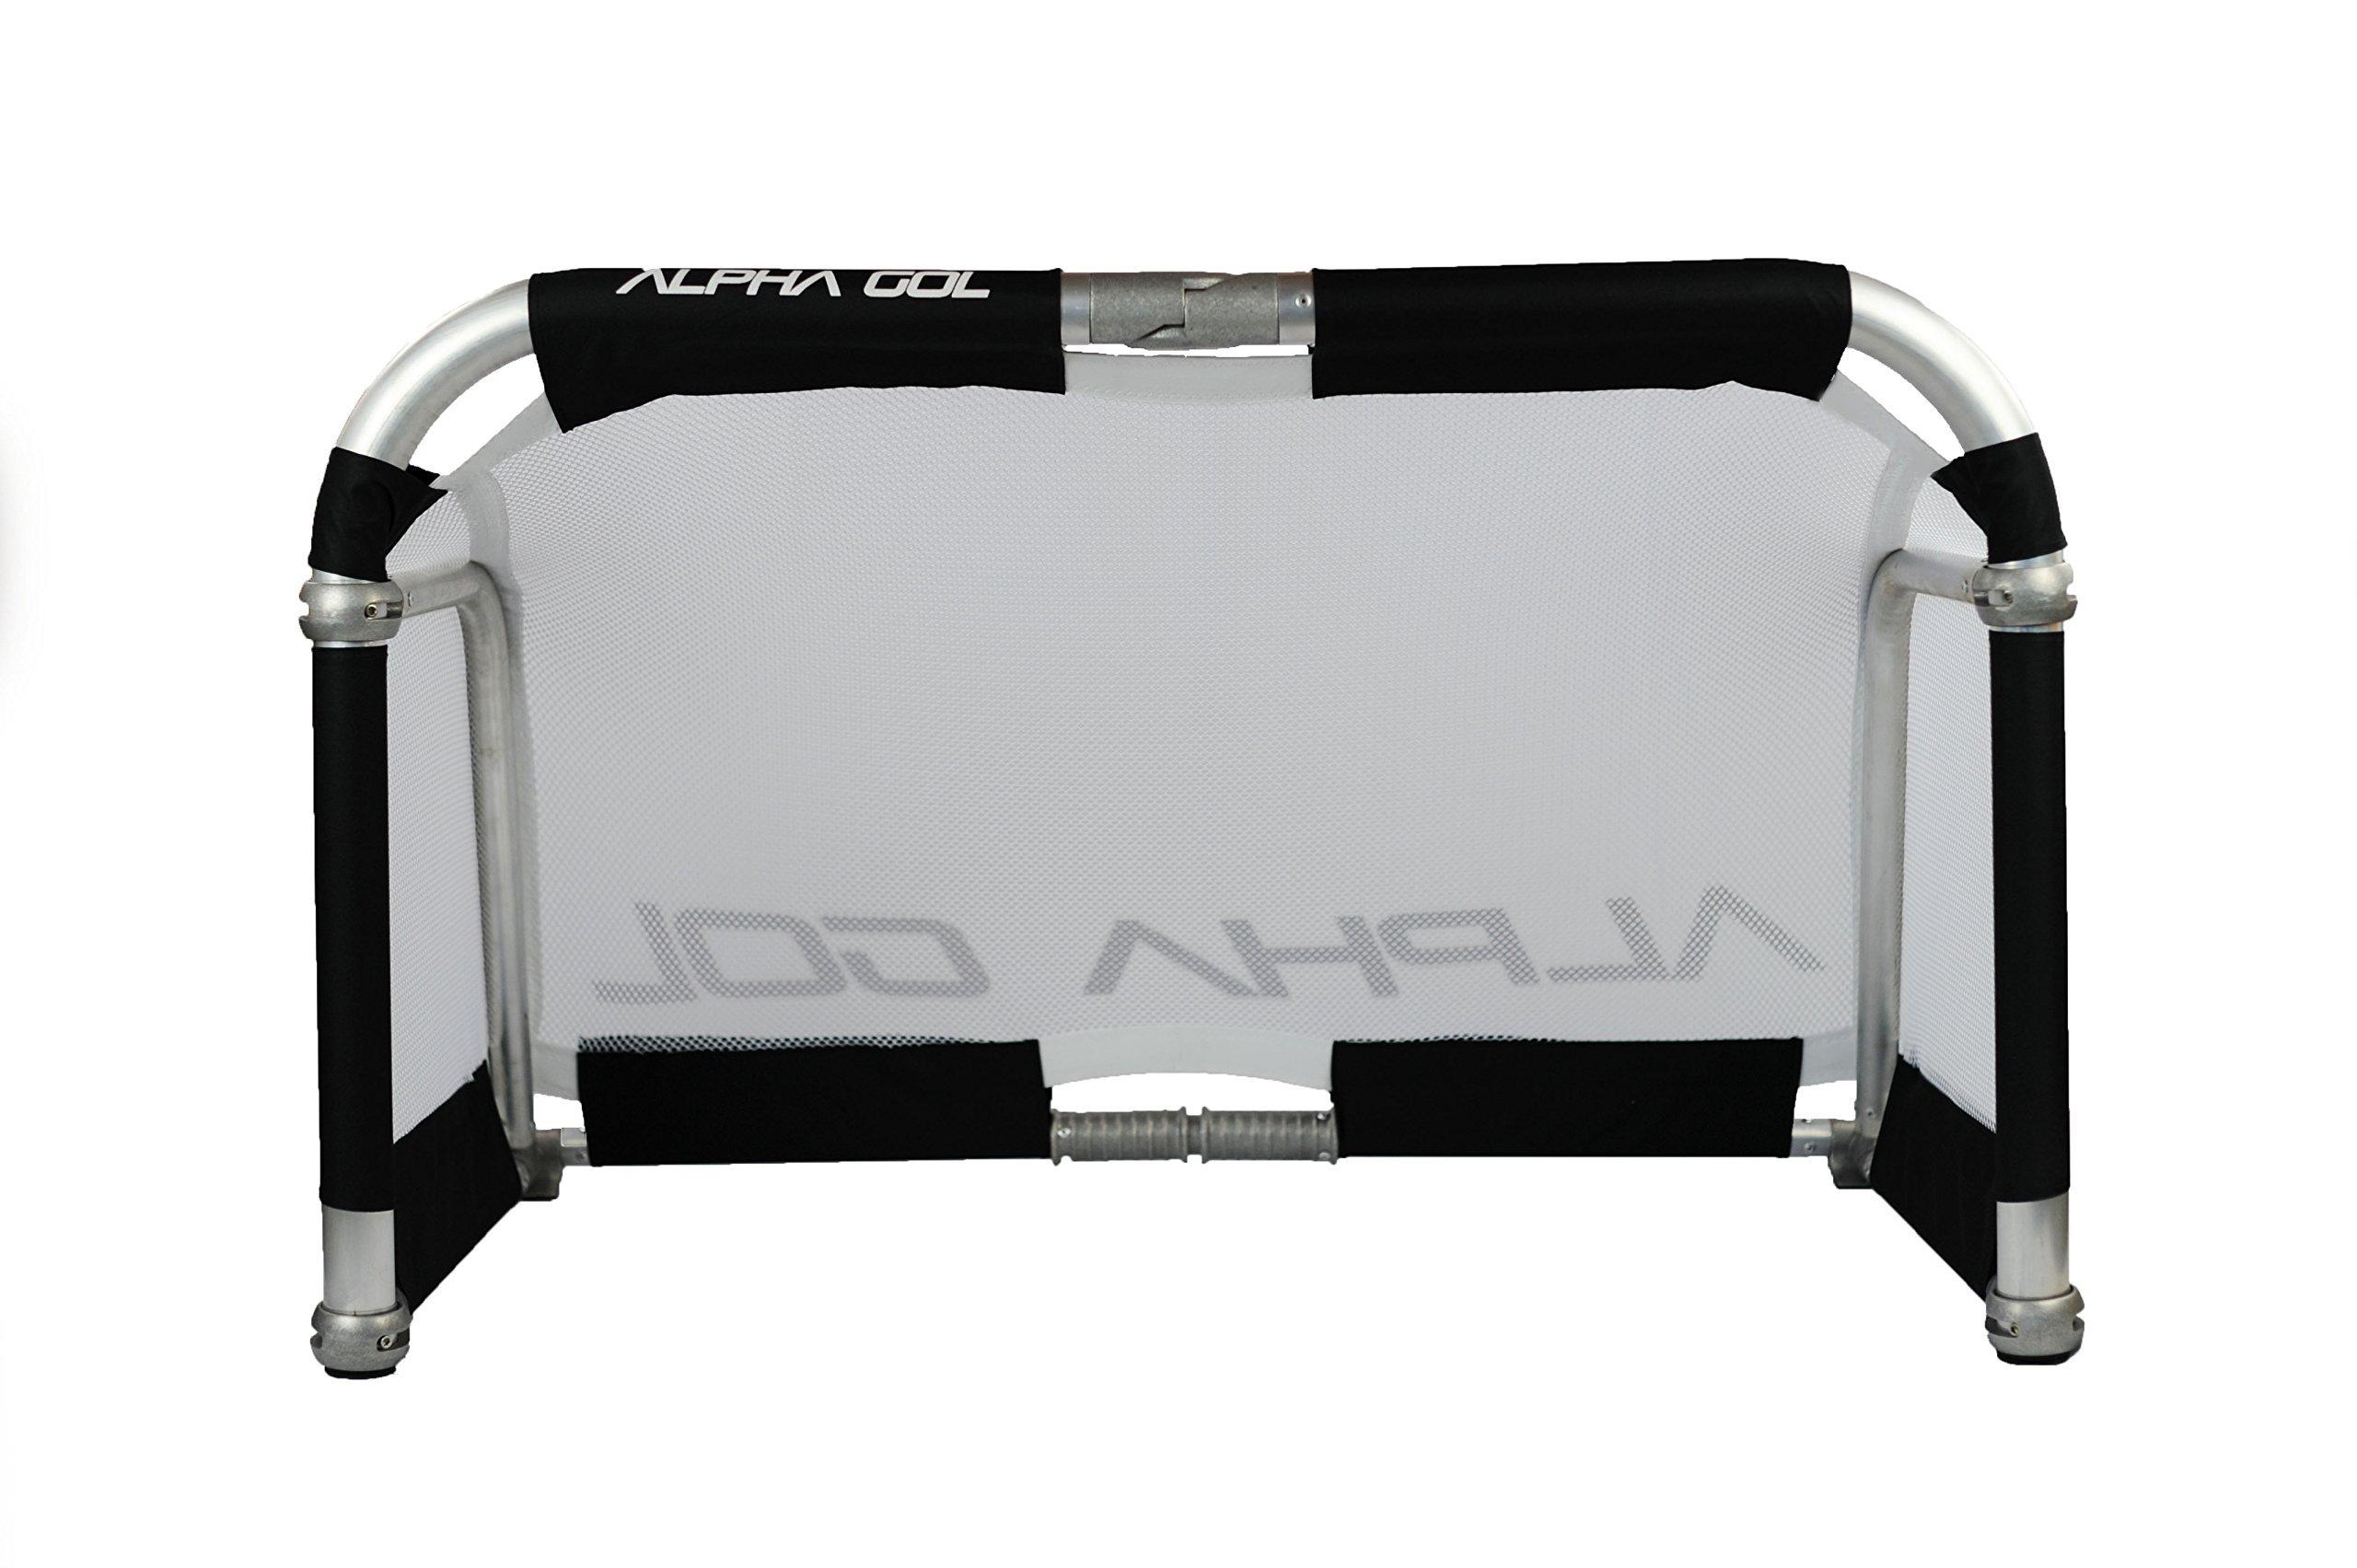 Alpha Goal - Aluminium Folding Goal - 3 feet by 5 feet with Carrying Case